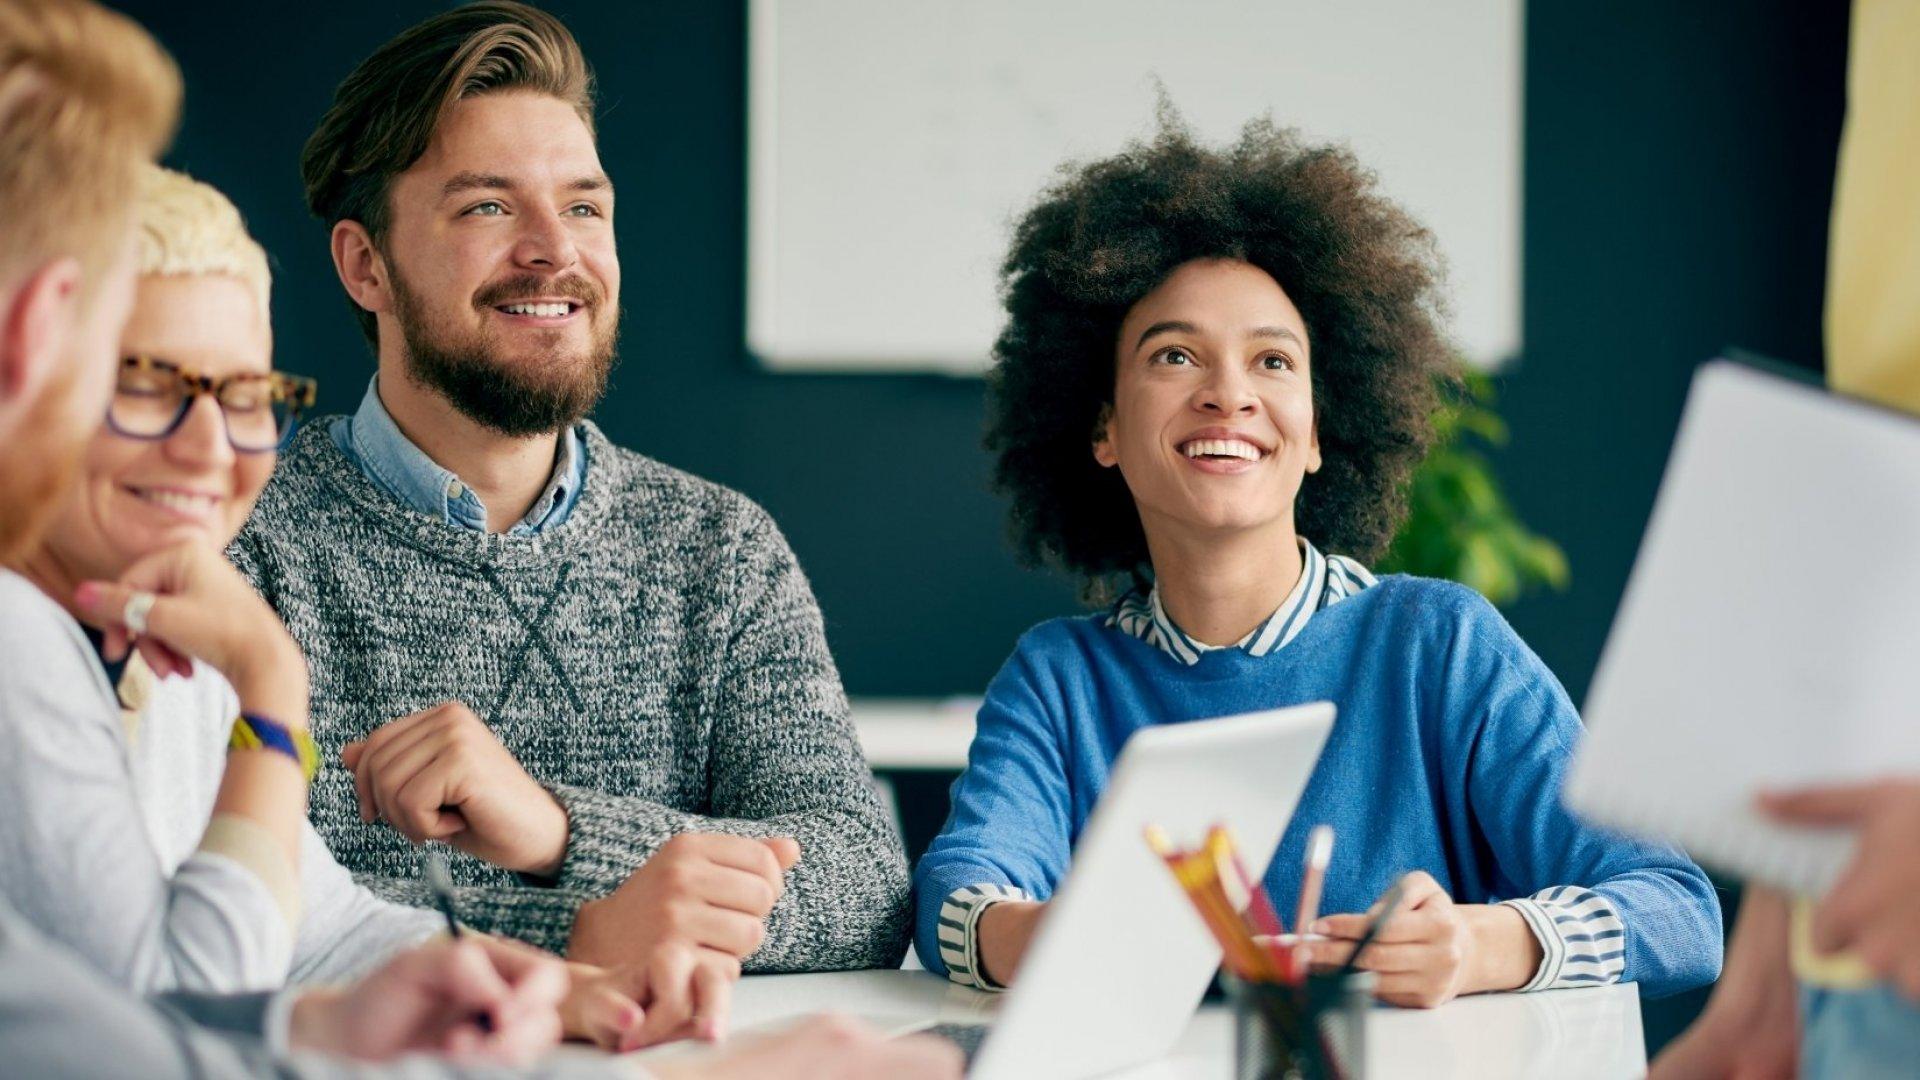 Why Your Company Needs to Become a Wellness Company